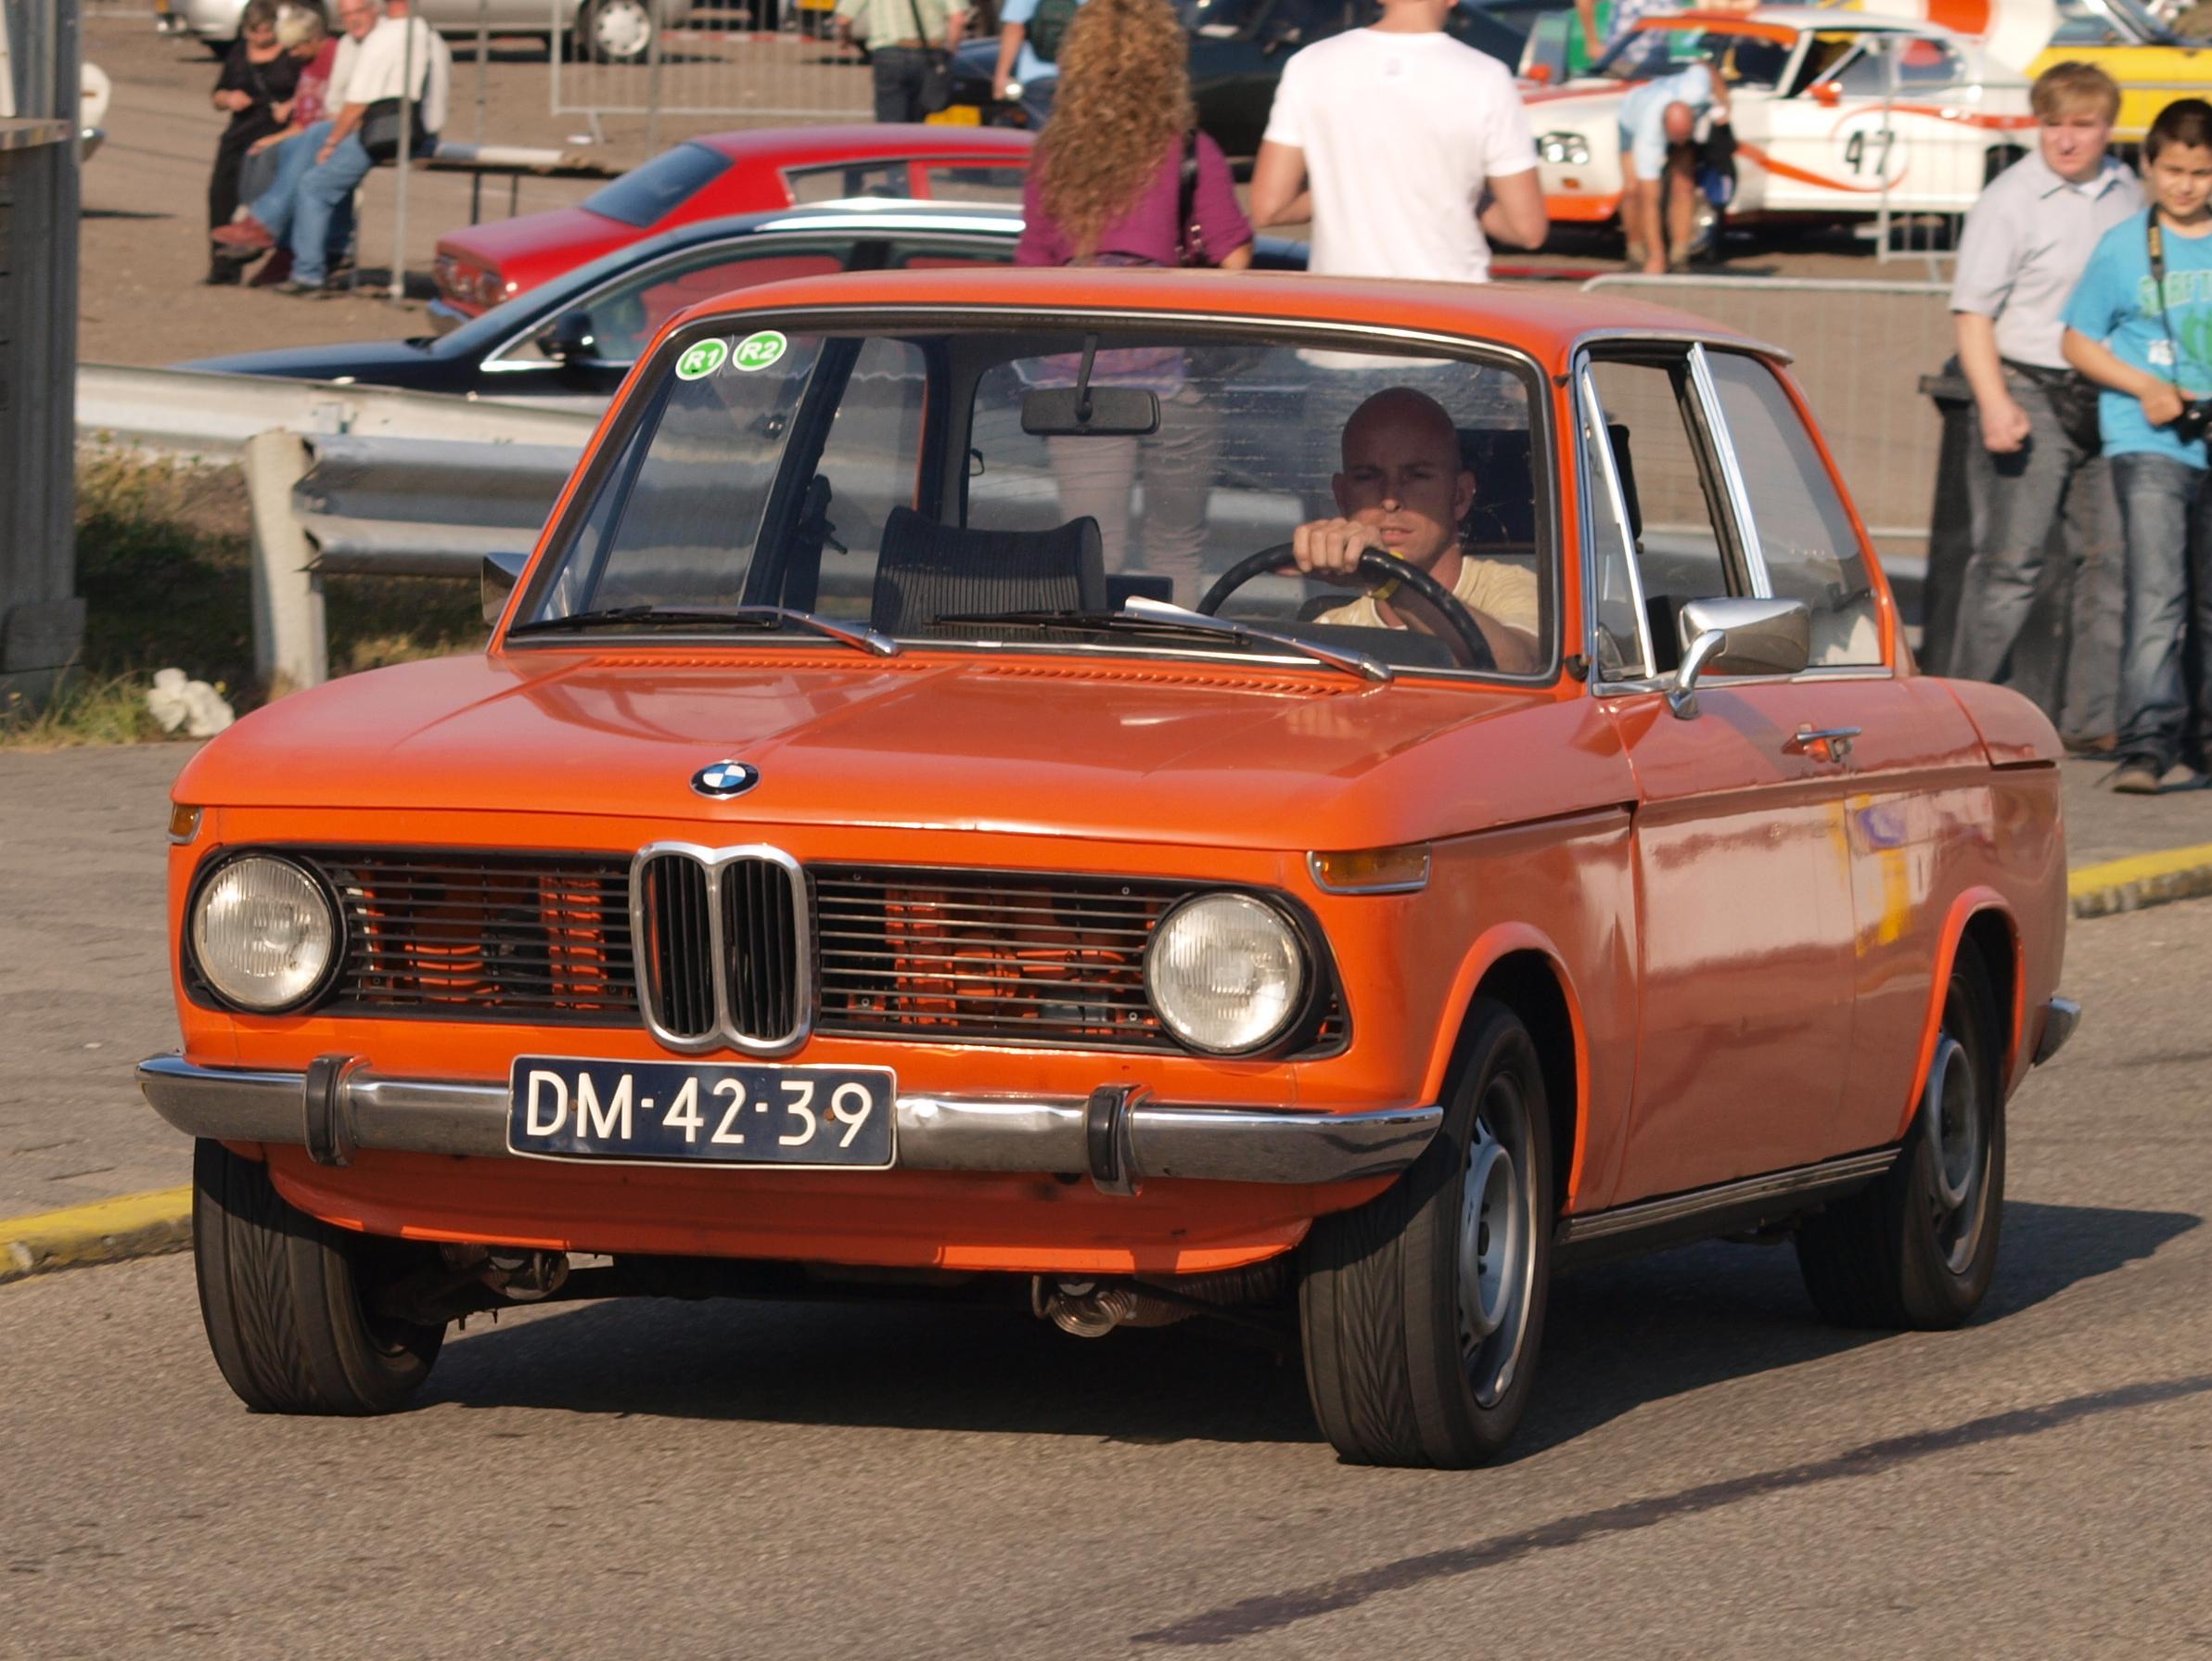 File:BMW 1600-2 dutch licence registration DM-42-39-.JPG - Wikimedia ...